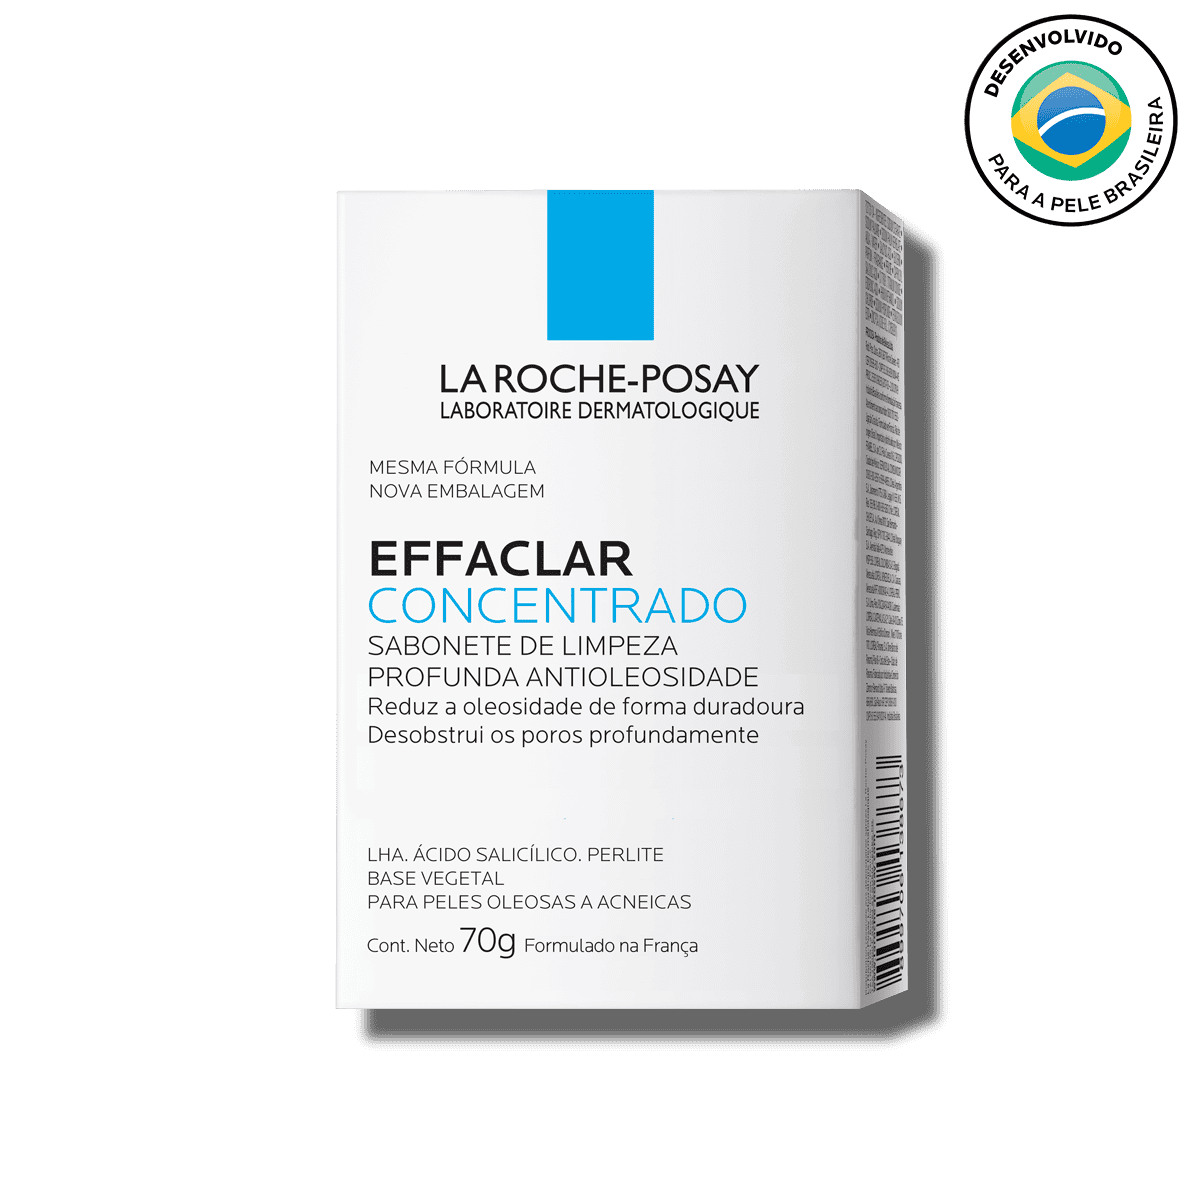 Effaclar Sabonete Concentrado | SELO |